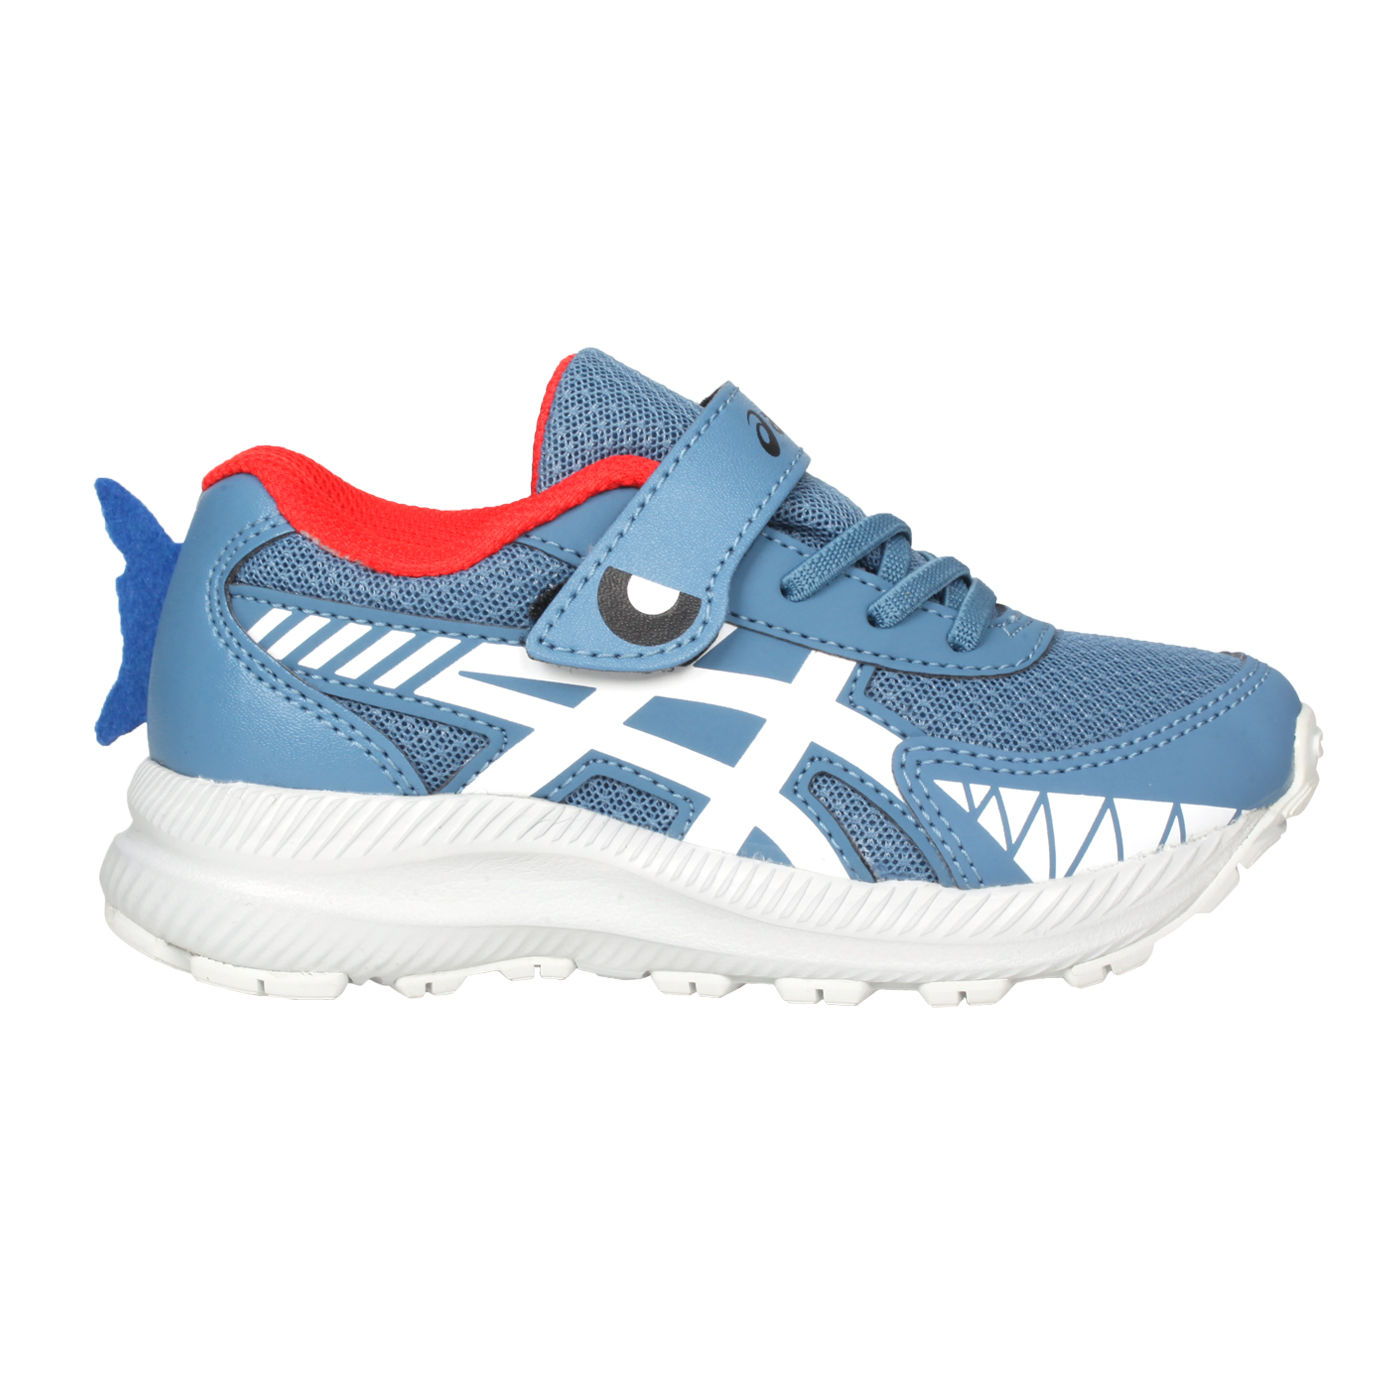 ASICS 中童慢跑鞋  @CONTEND 7 PS SCHOOL YARD@1014A208-404